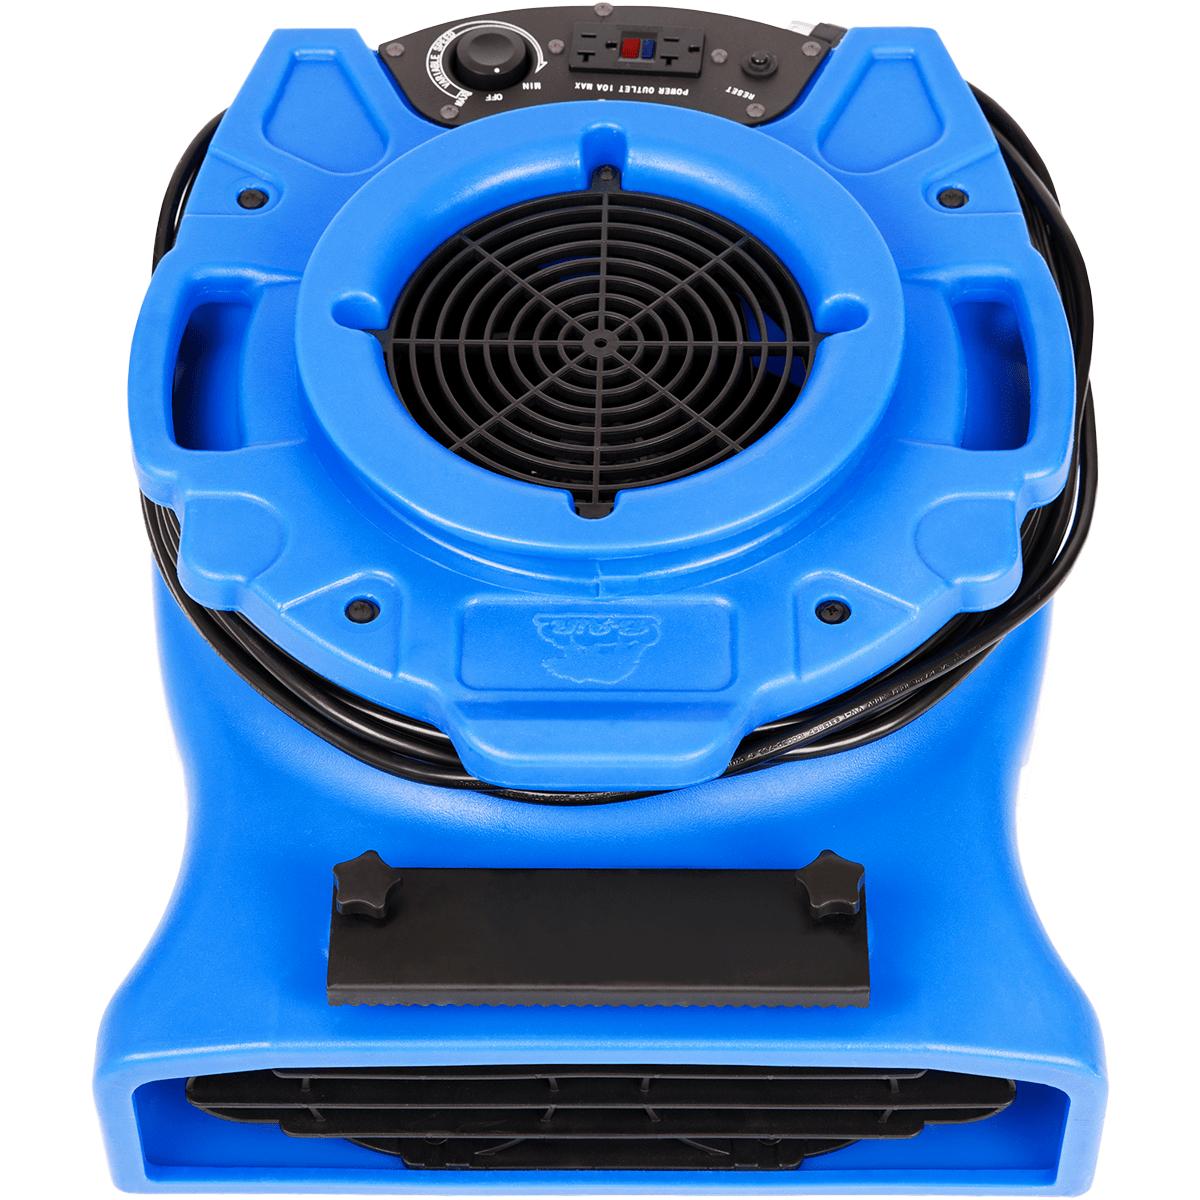 B-air Ventlo-25 Low Profile Air Mover - Blue